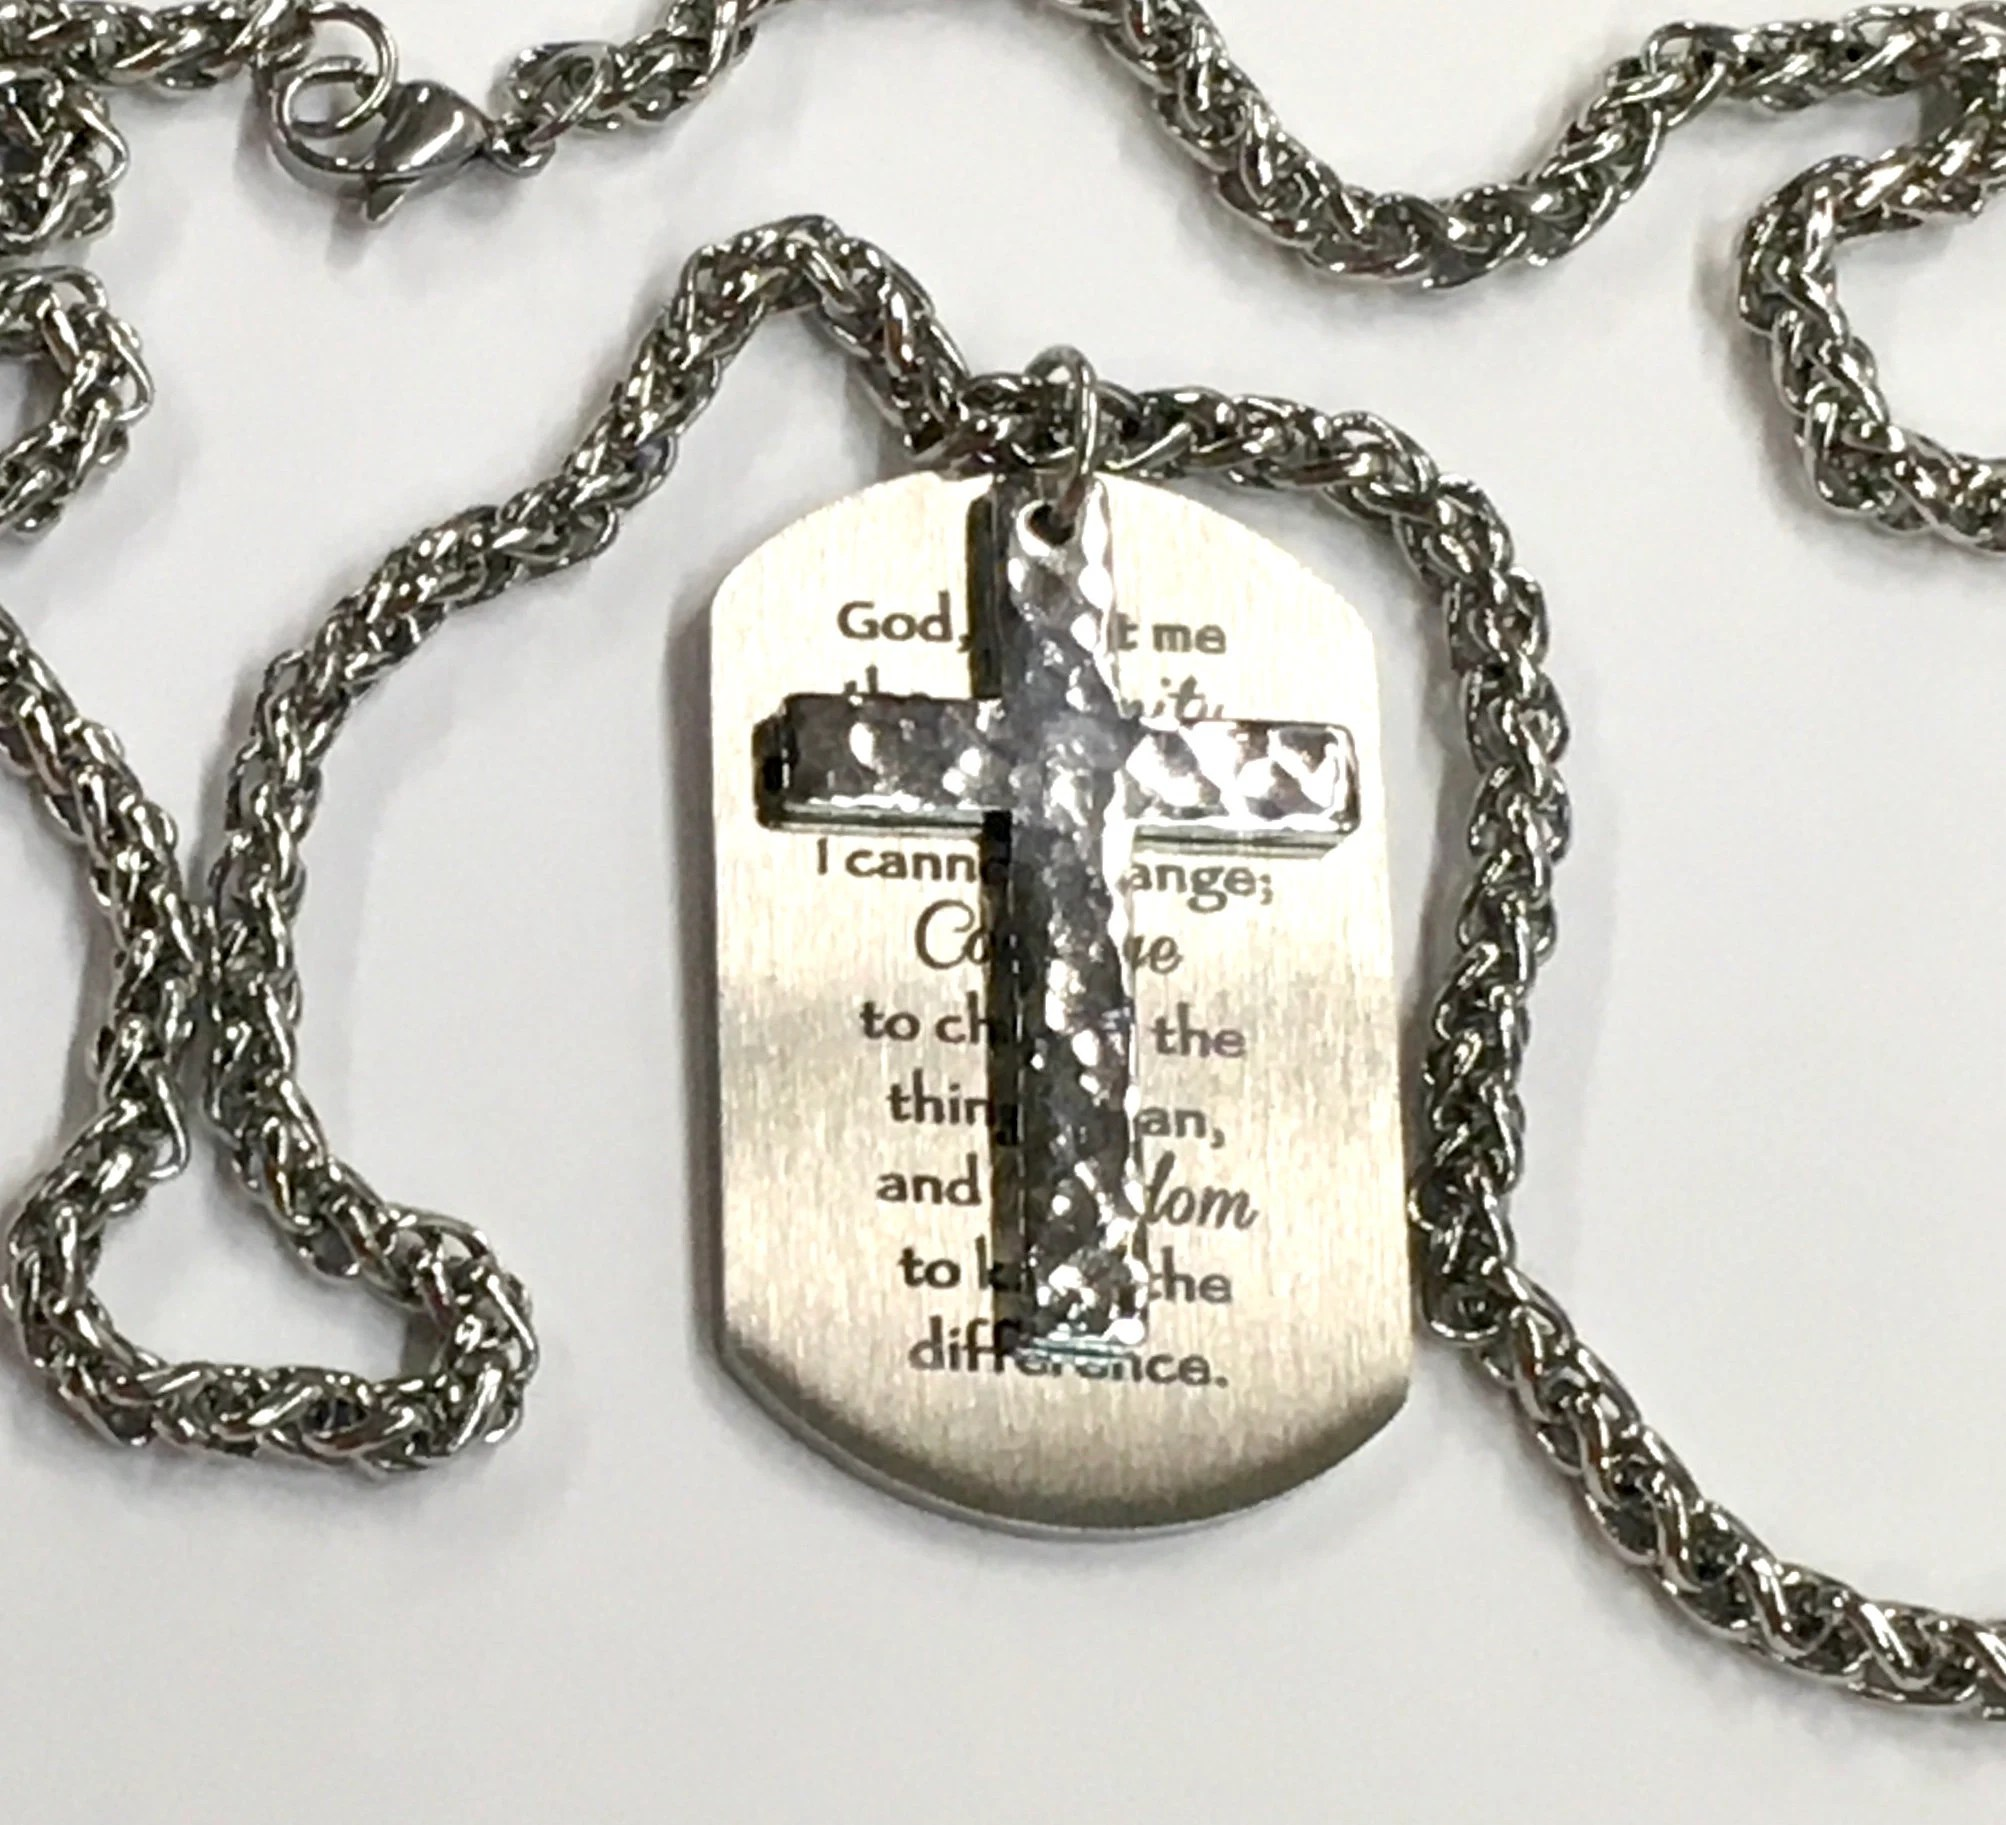 Serenity Prayer Necklace Handmade Hand Hammered Cross